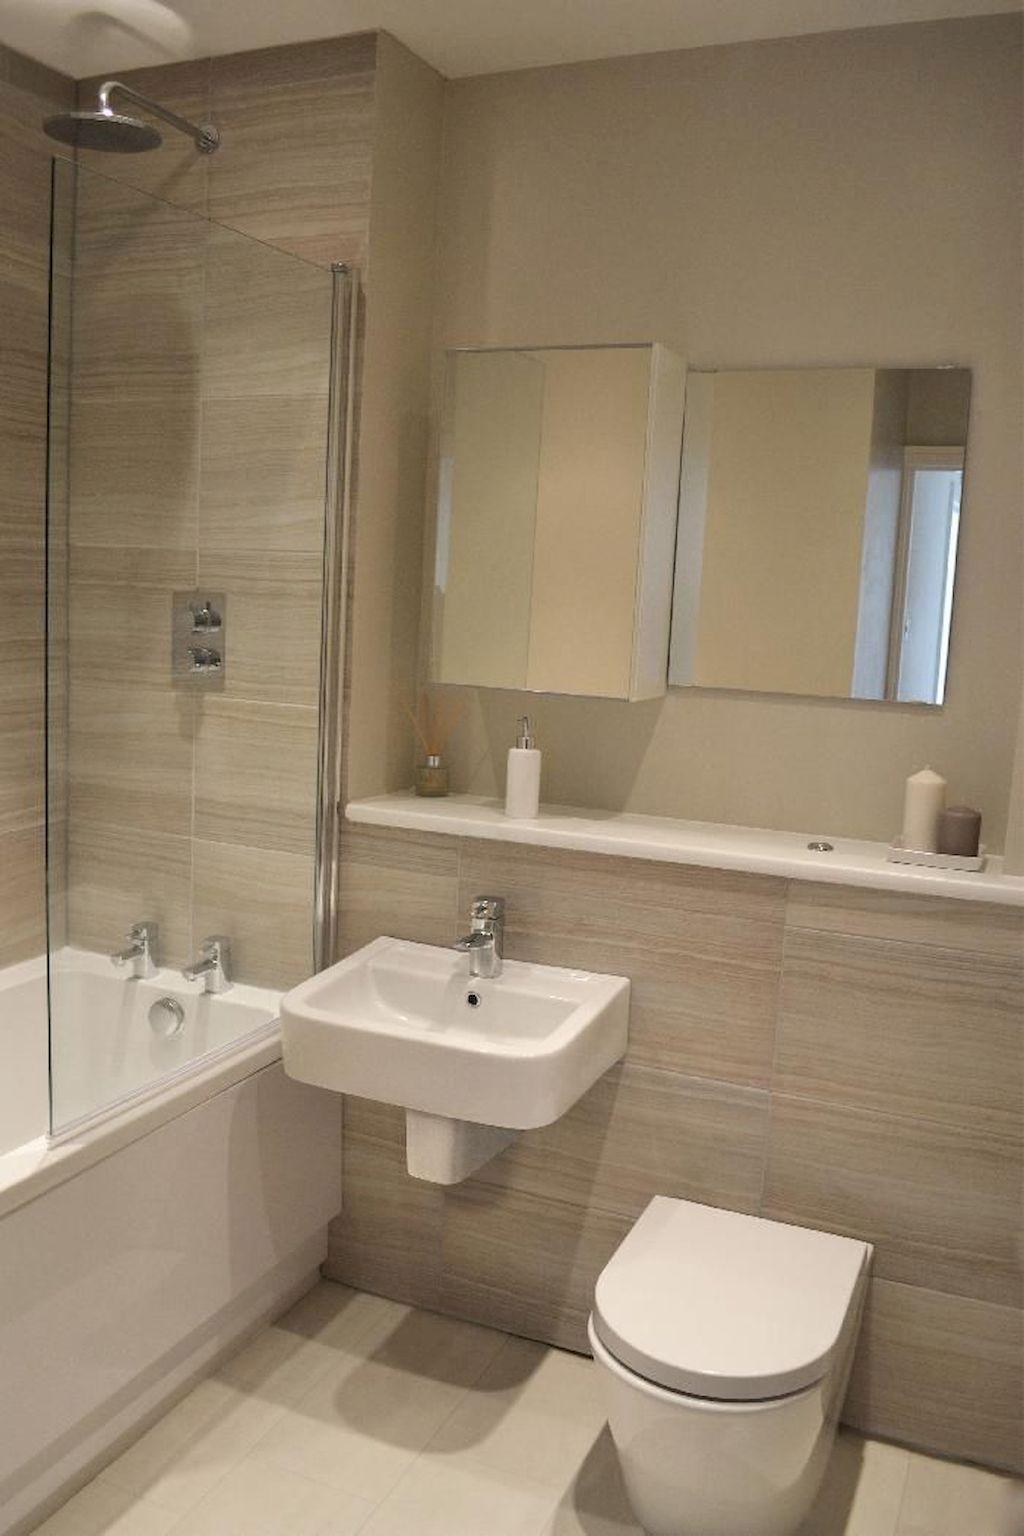 111 Brilliant Small Bathroom Remodel Ideas On A Budget 81 Small Bathroom Bathroom Layout Bathroom Design Small